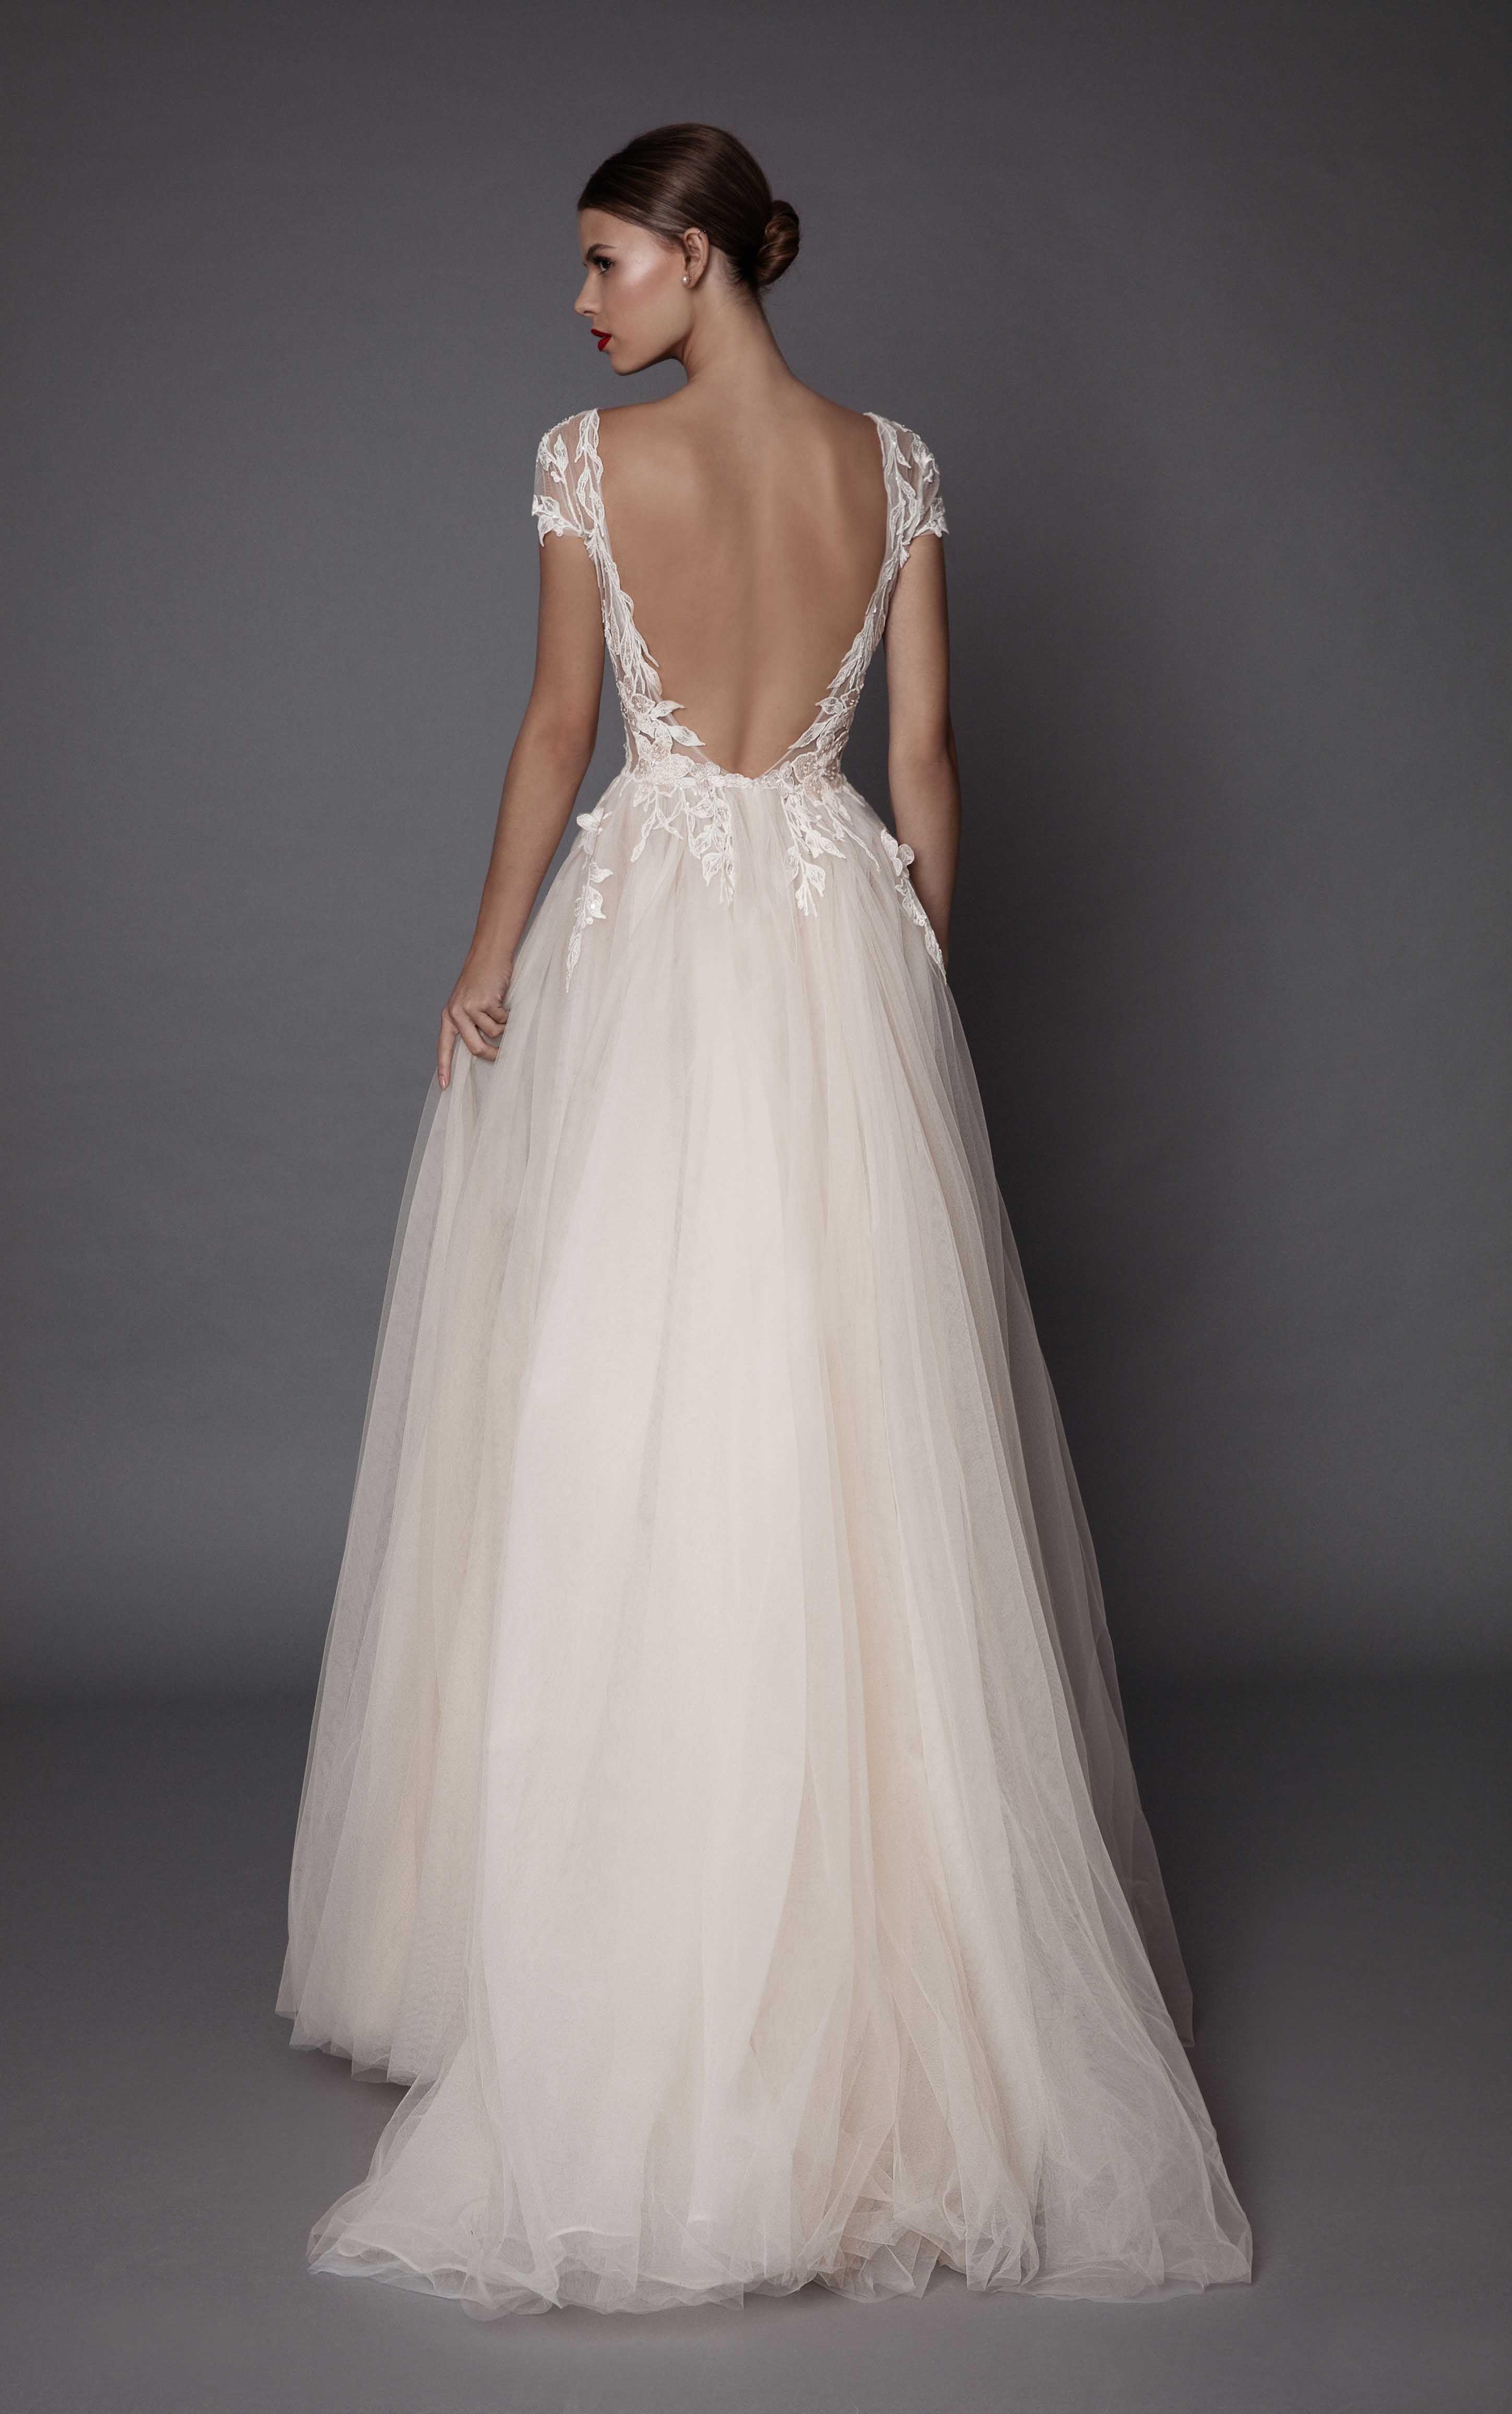 Fancy MUSE Berta Antonia Ethereal Wedding DressWedding